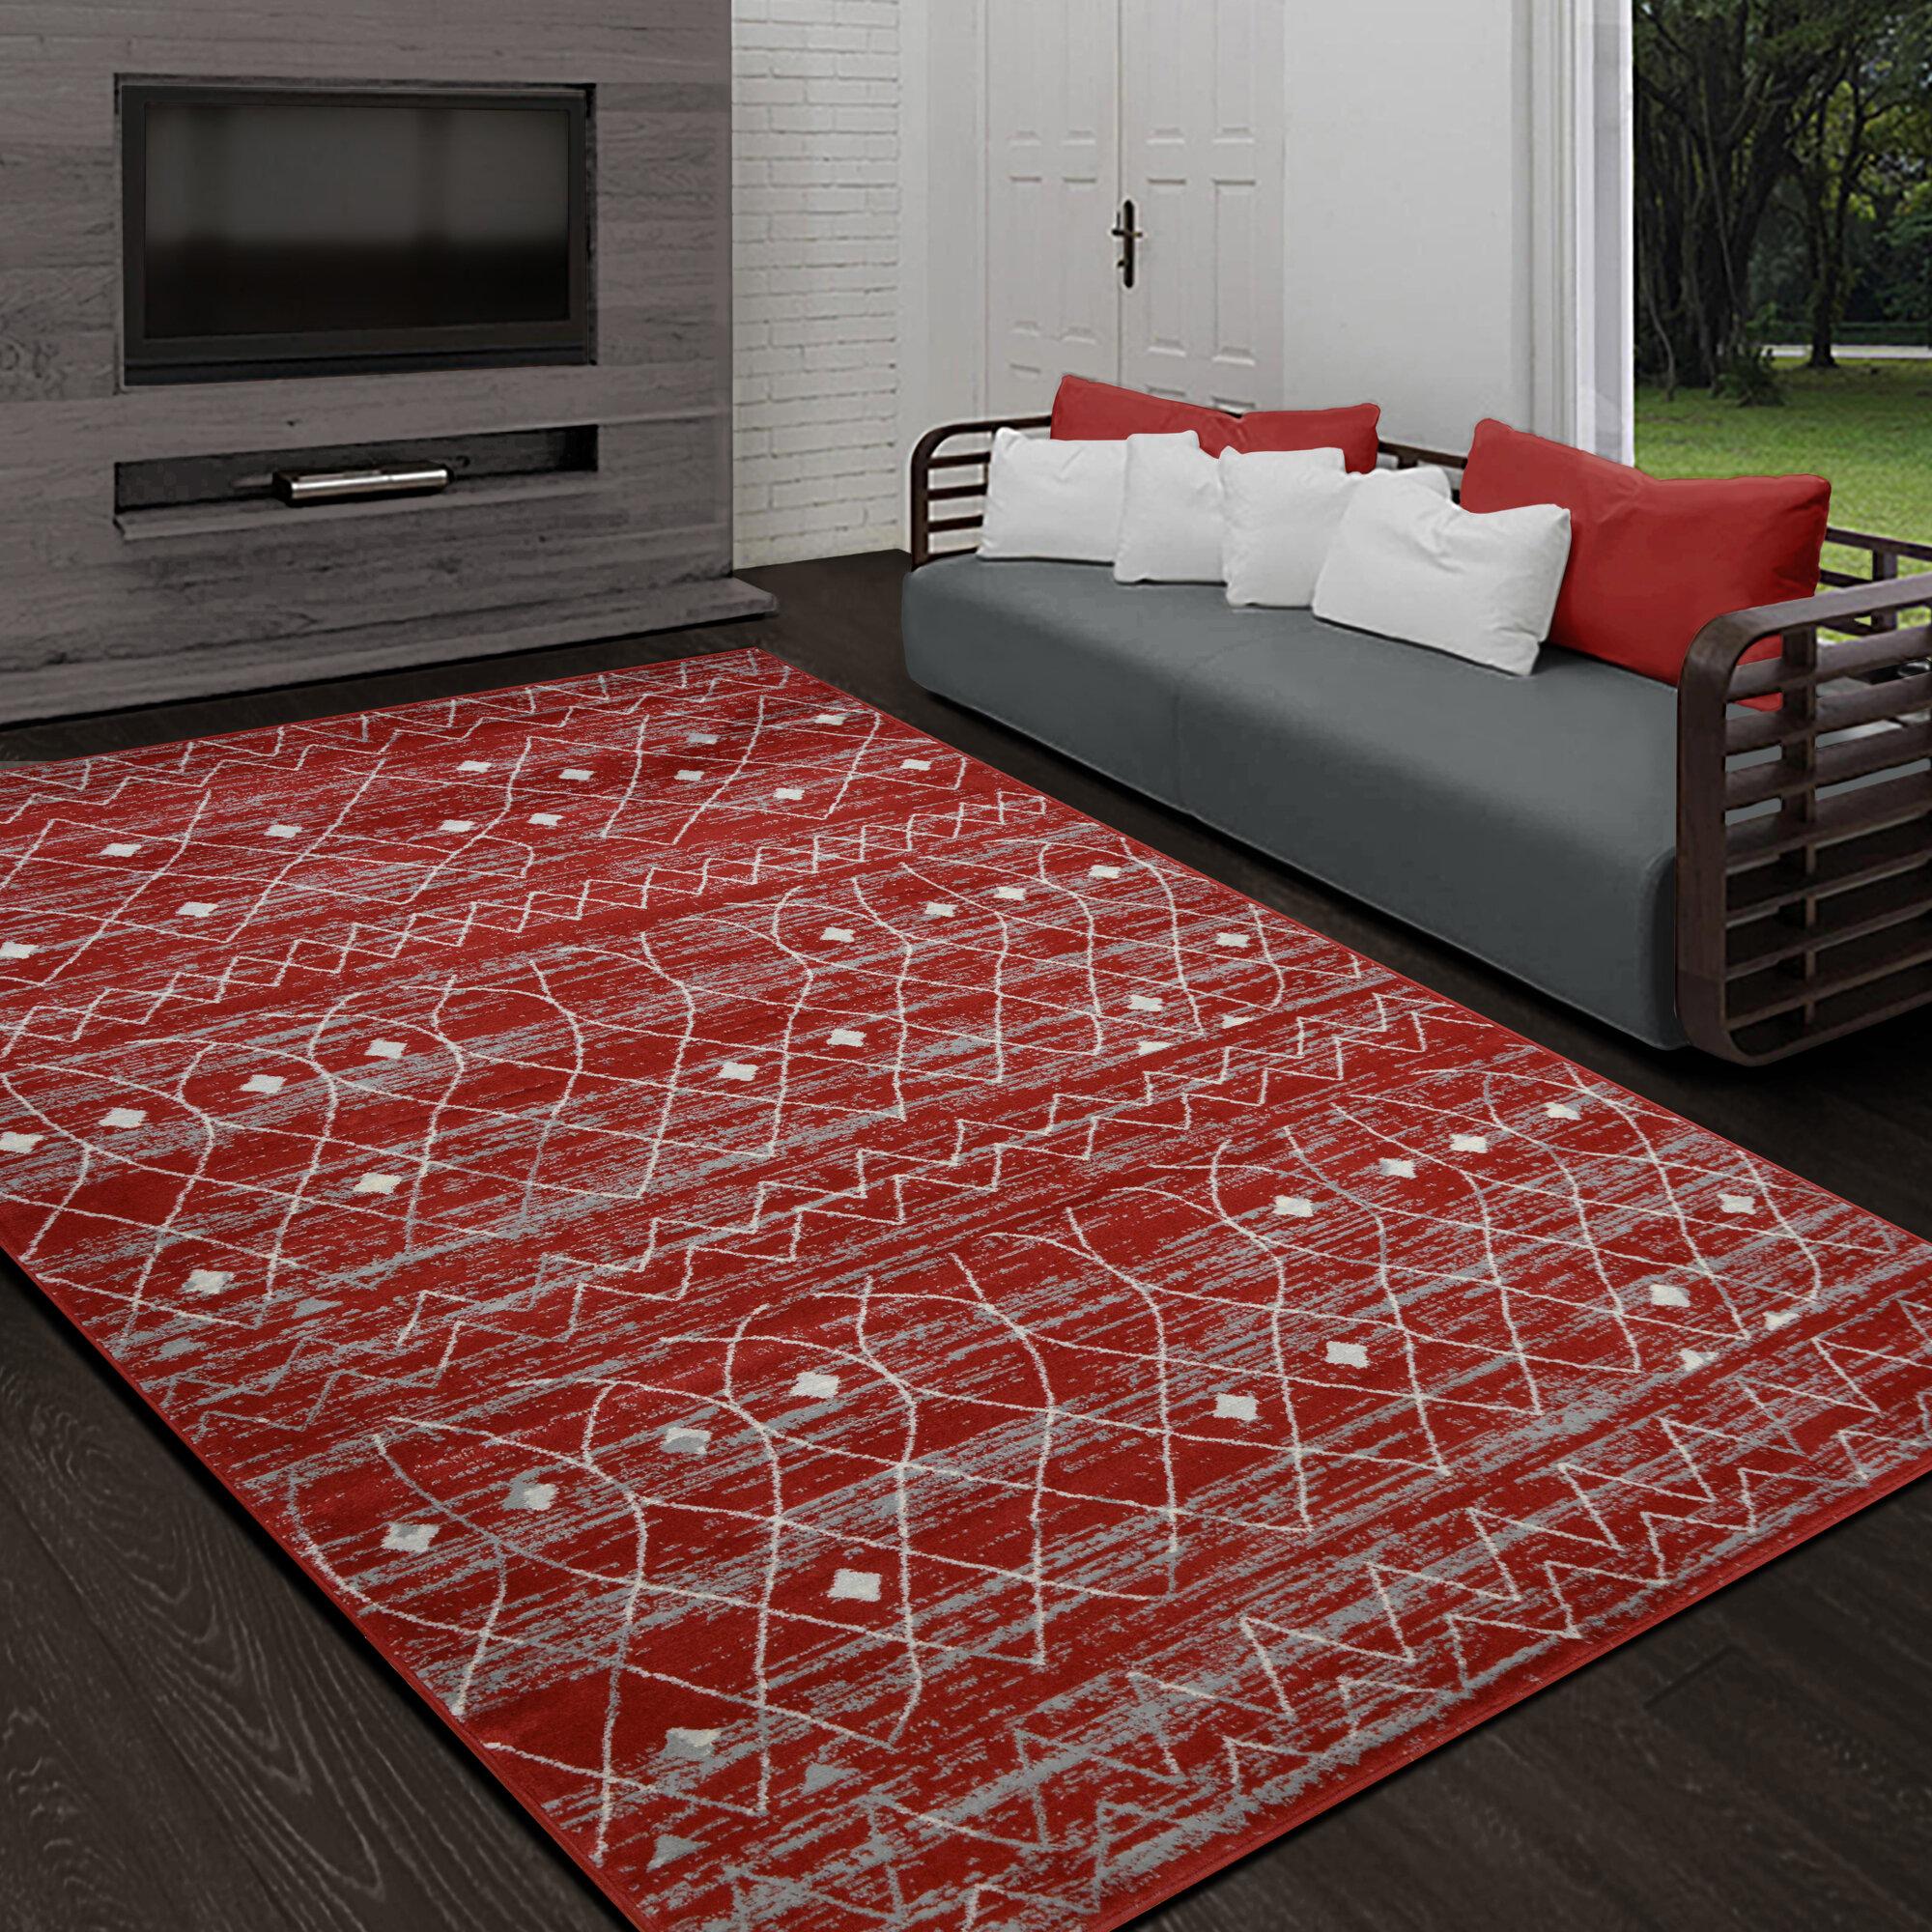 Foundry Select Hudson Yards Scarlet Red Area Rug Wayfair